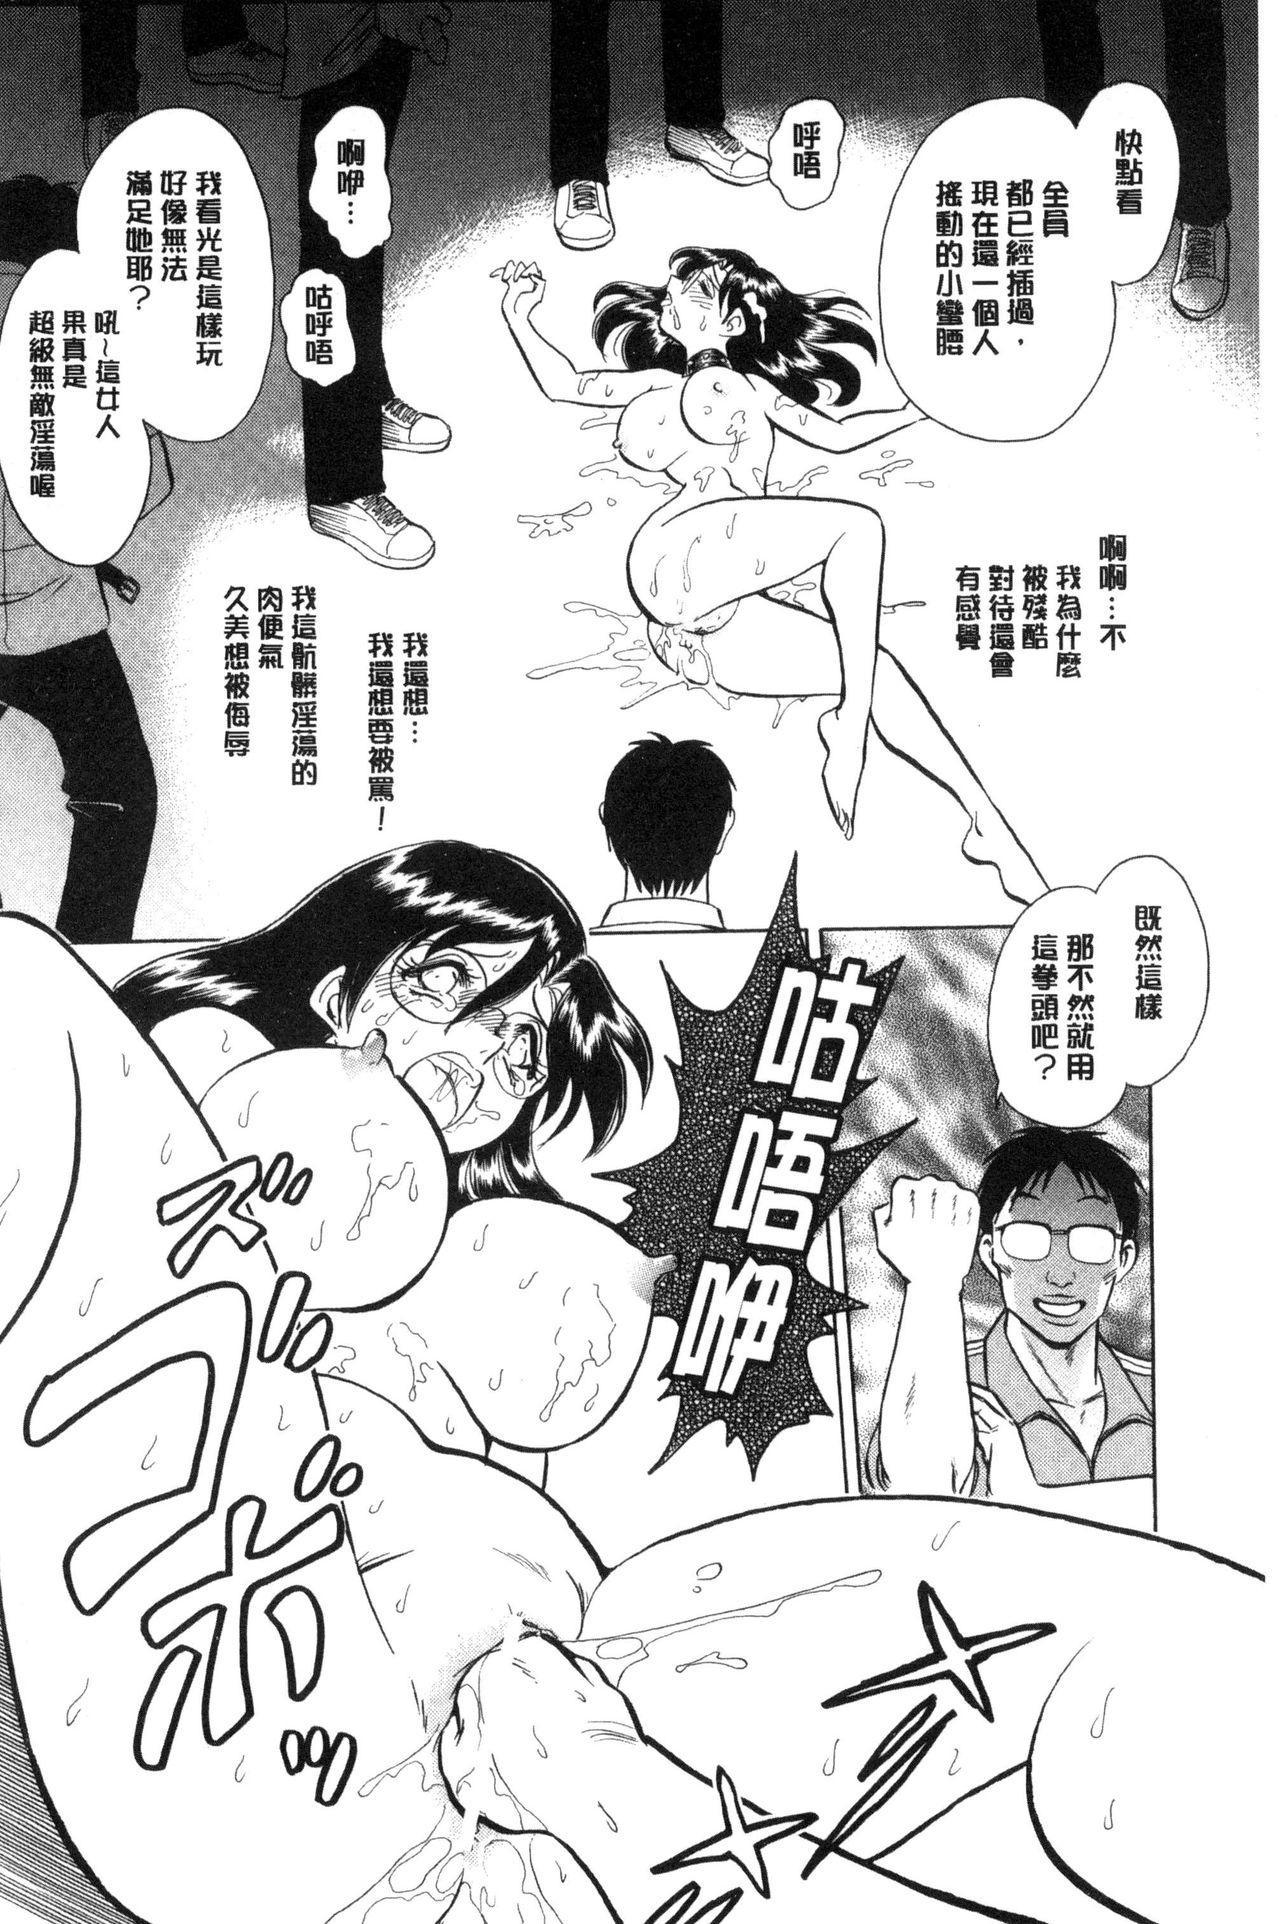 Hazukashii Kagai Jugyou | 害羞的課外授業 96